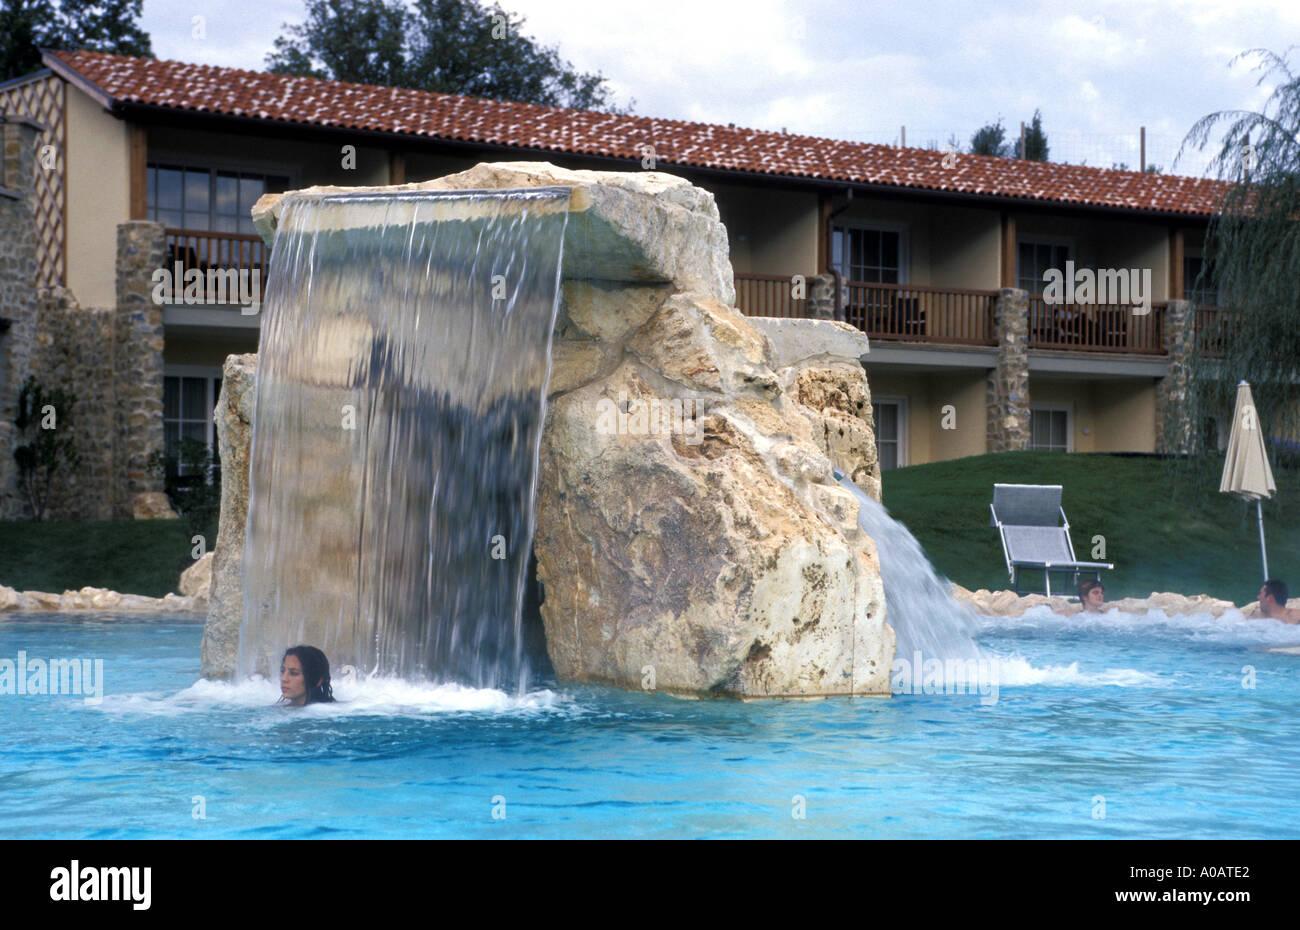 Photo g picture of adler spa resort thermae bagno vignoni